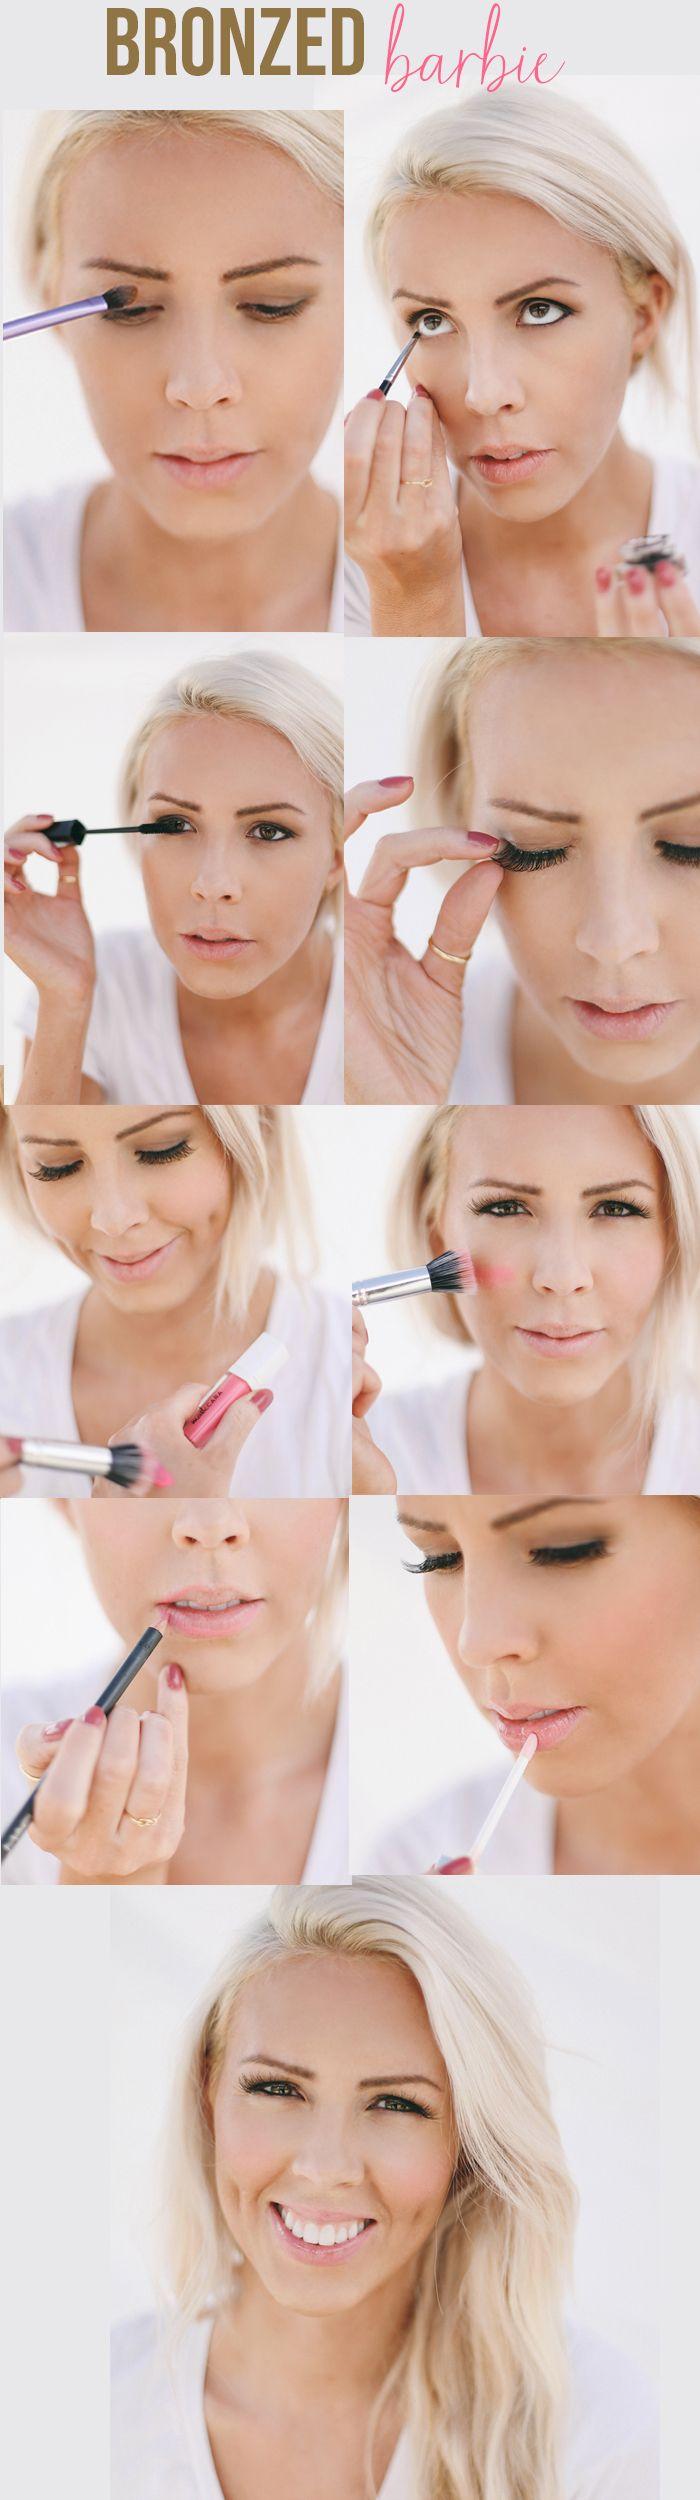 Bronzed Barbie Makeup